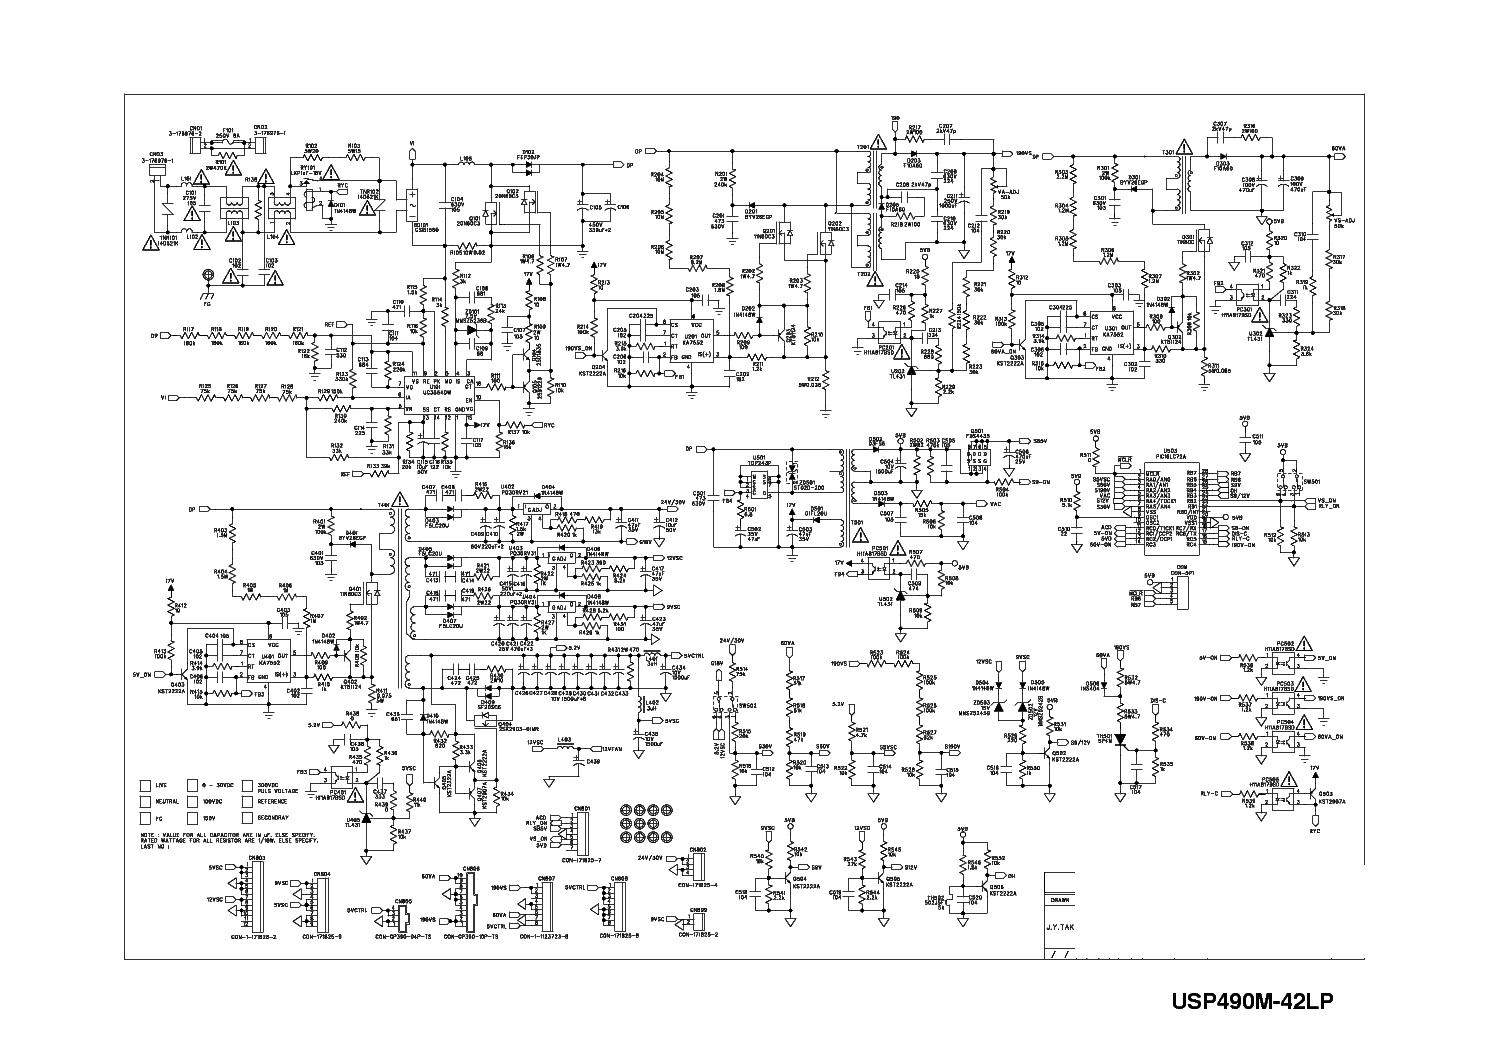 medium resolution of lg tv circuit diagram including power supply schematic diagram tv power supply schematic diagram likewise samsung led tv power supply